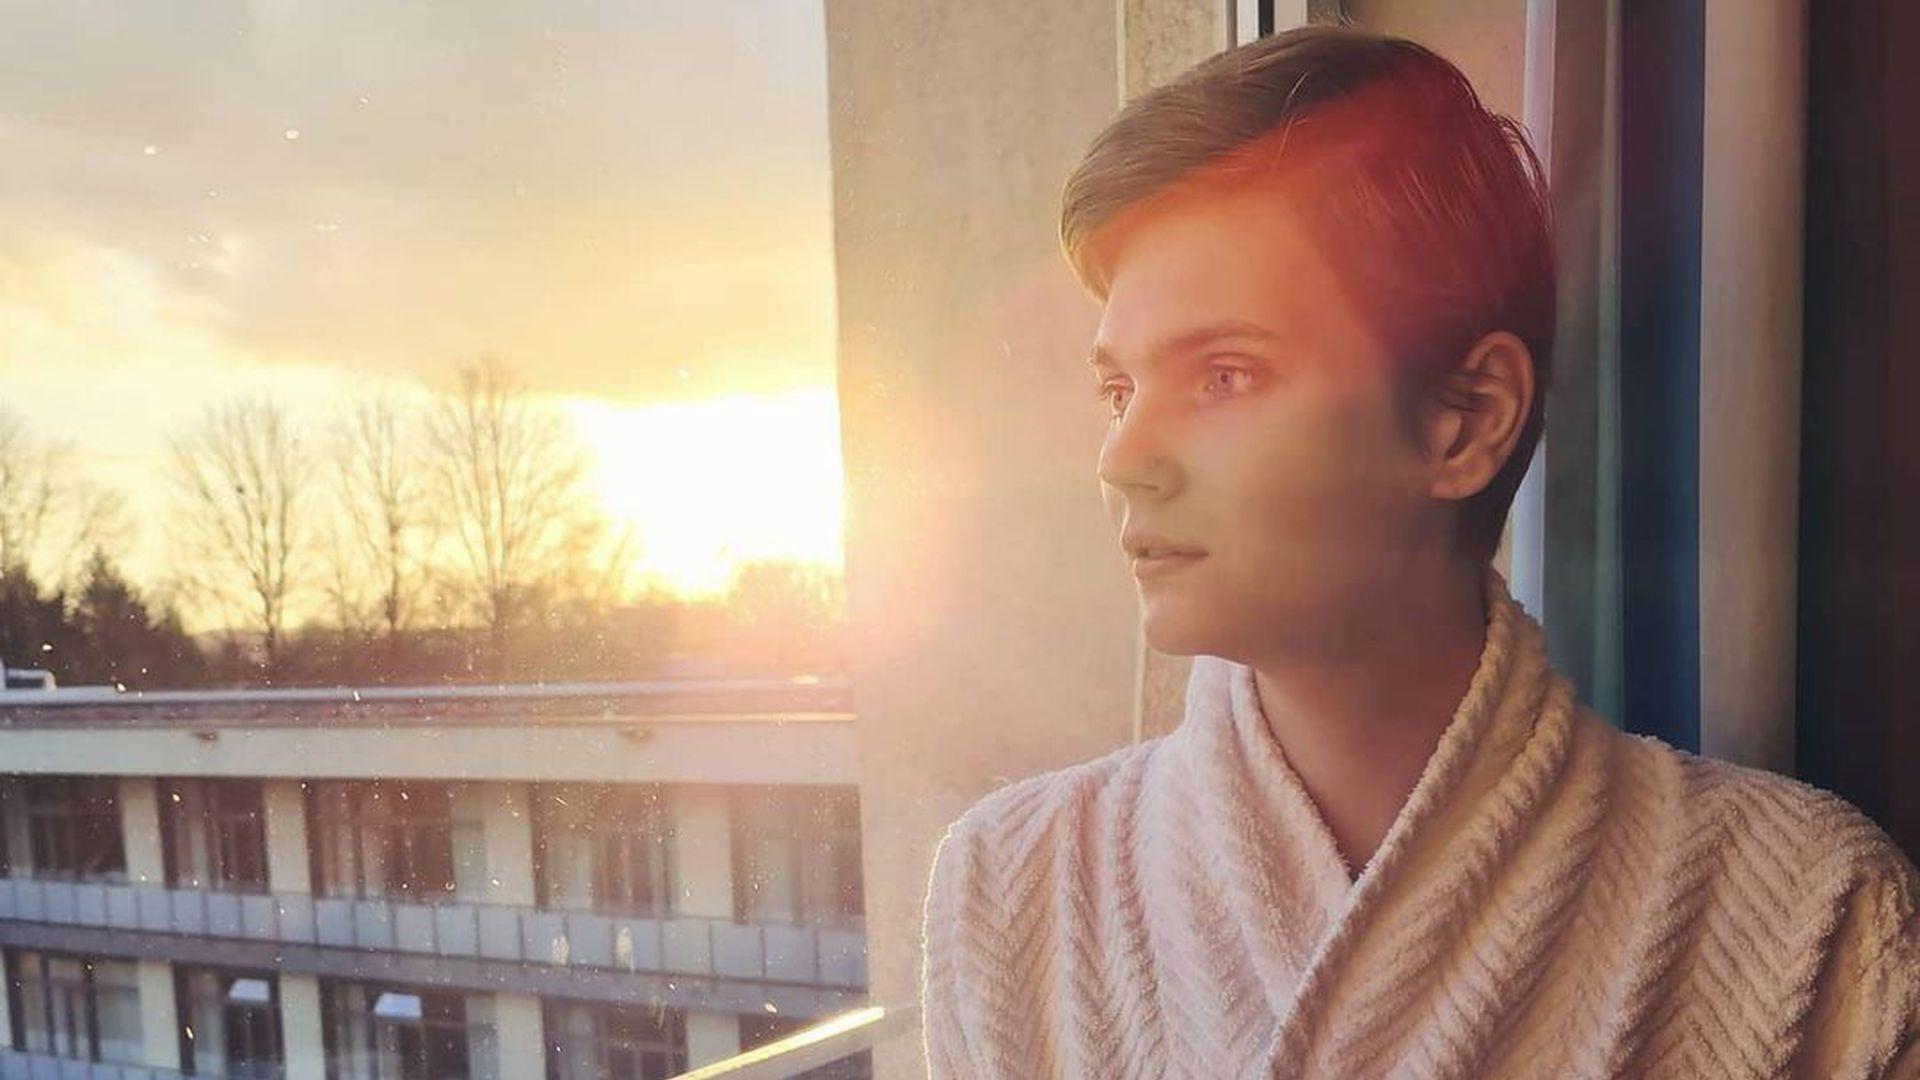 Klinik-verlassen-GNTM-Lucy-gibt-Update-nach-Geschlechts-OP